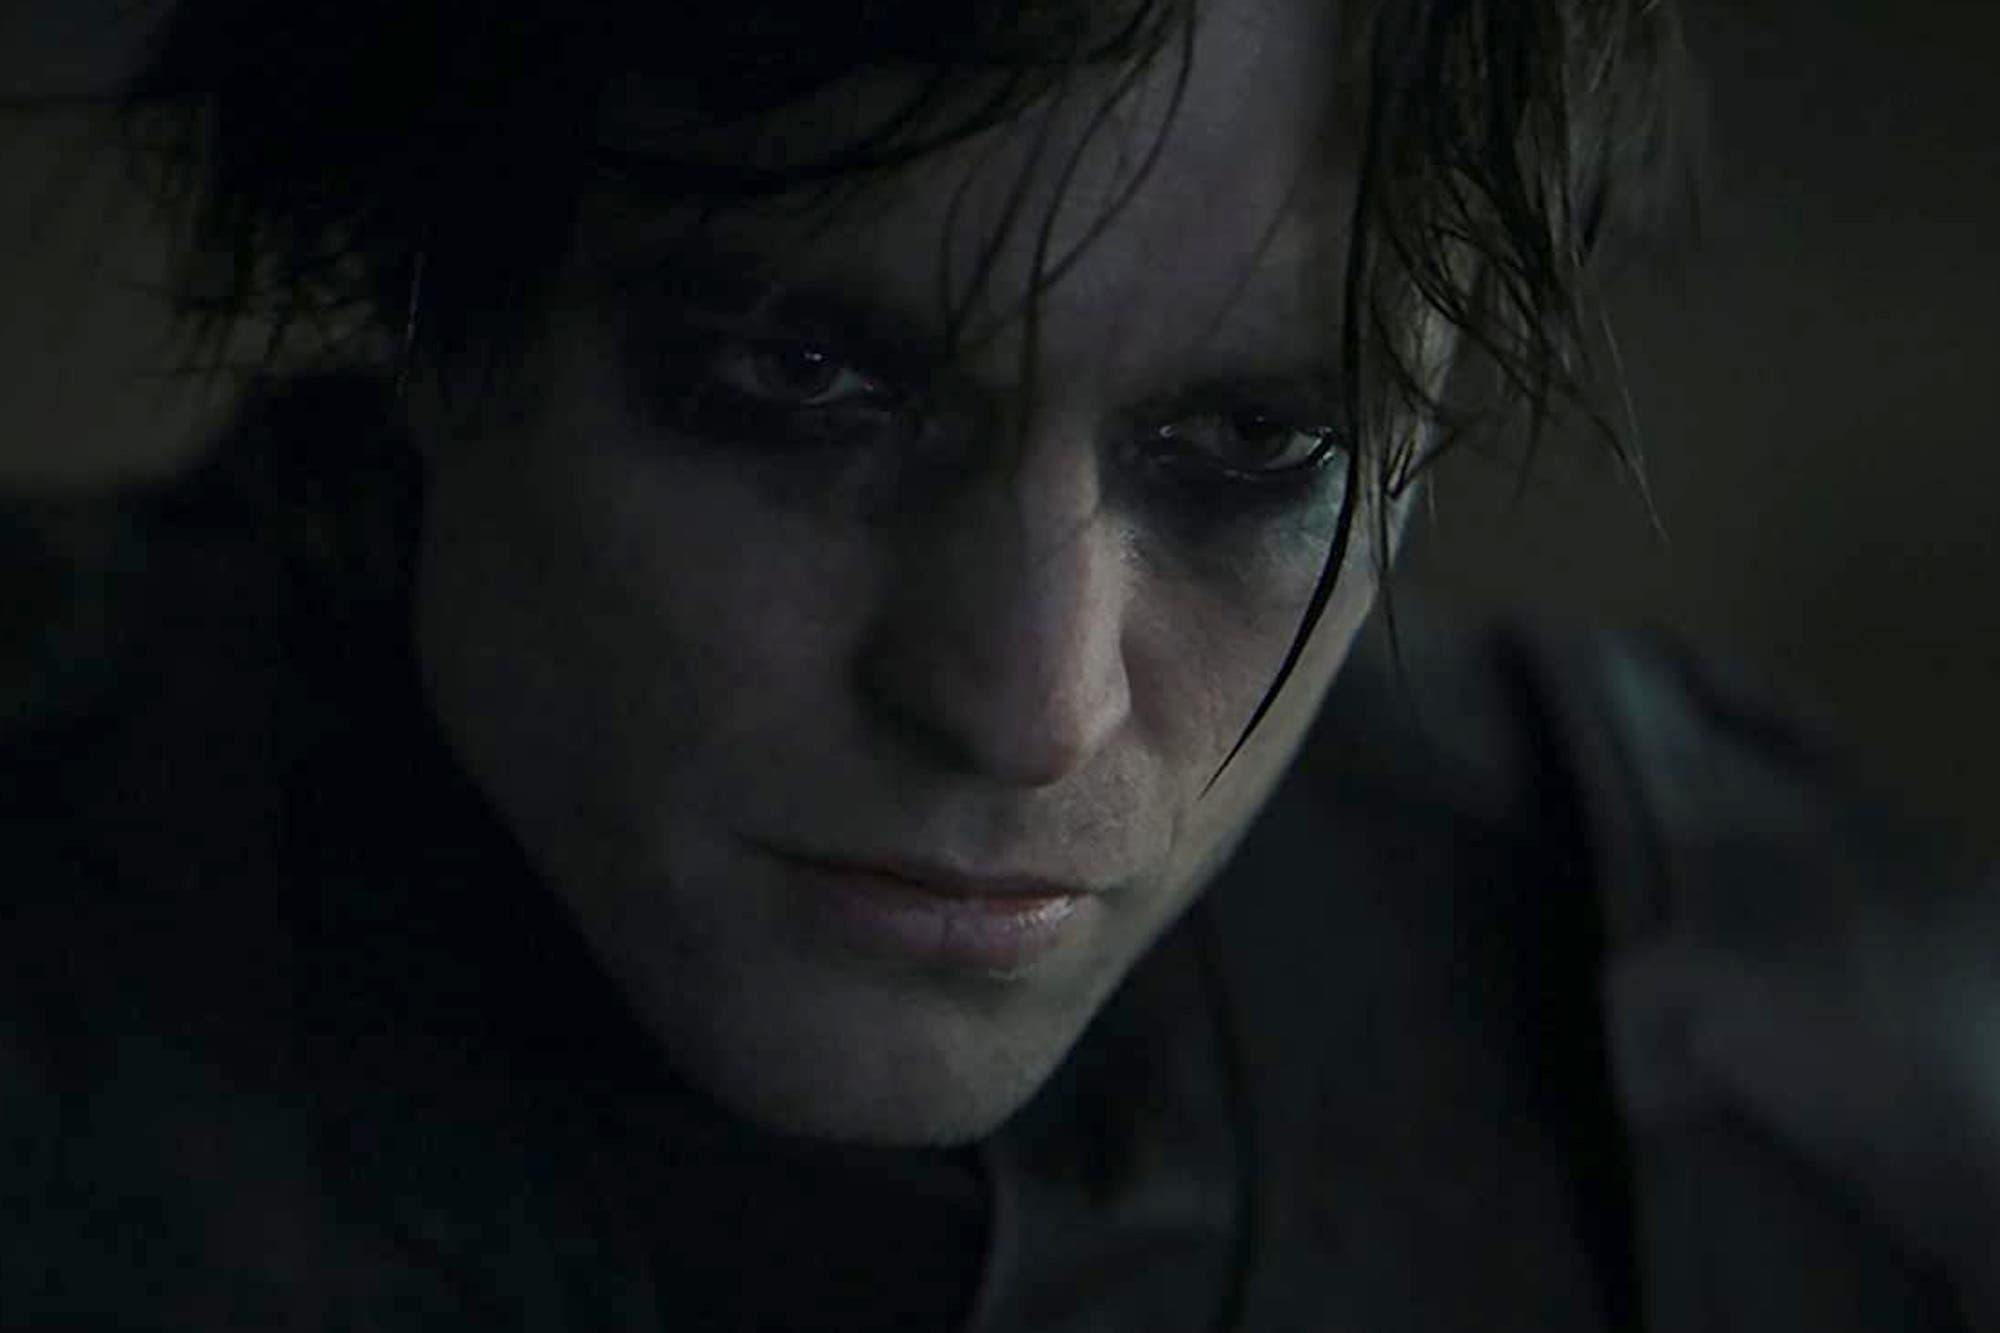 Coronavirus: tras la recuperación de Robert Pattinson, retoman el rodaje de The Batman